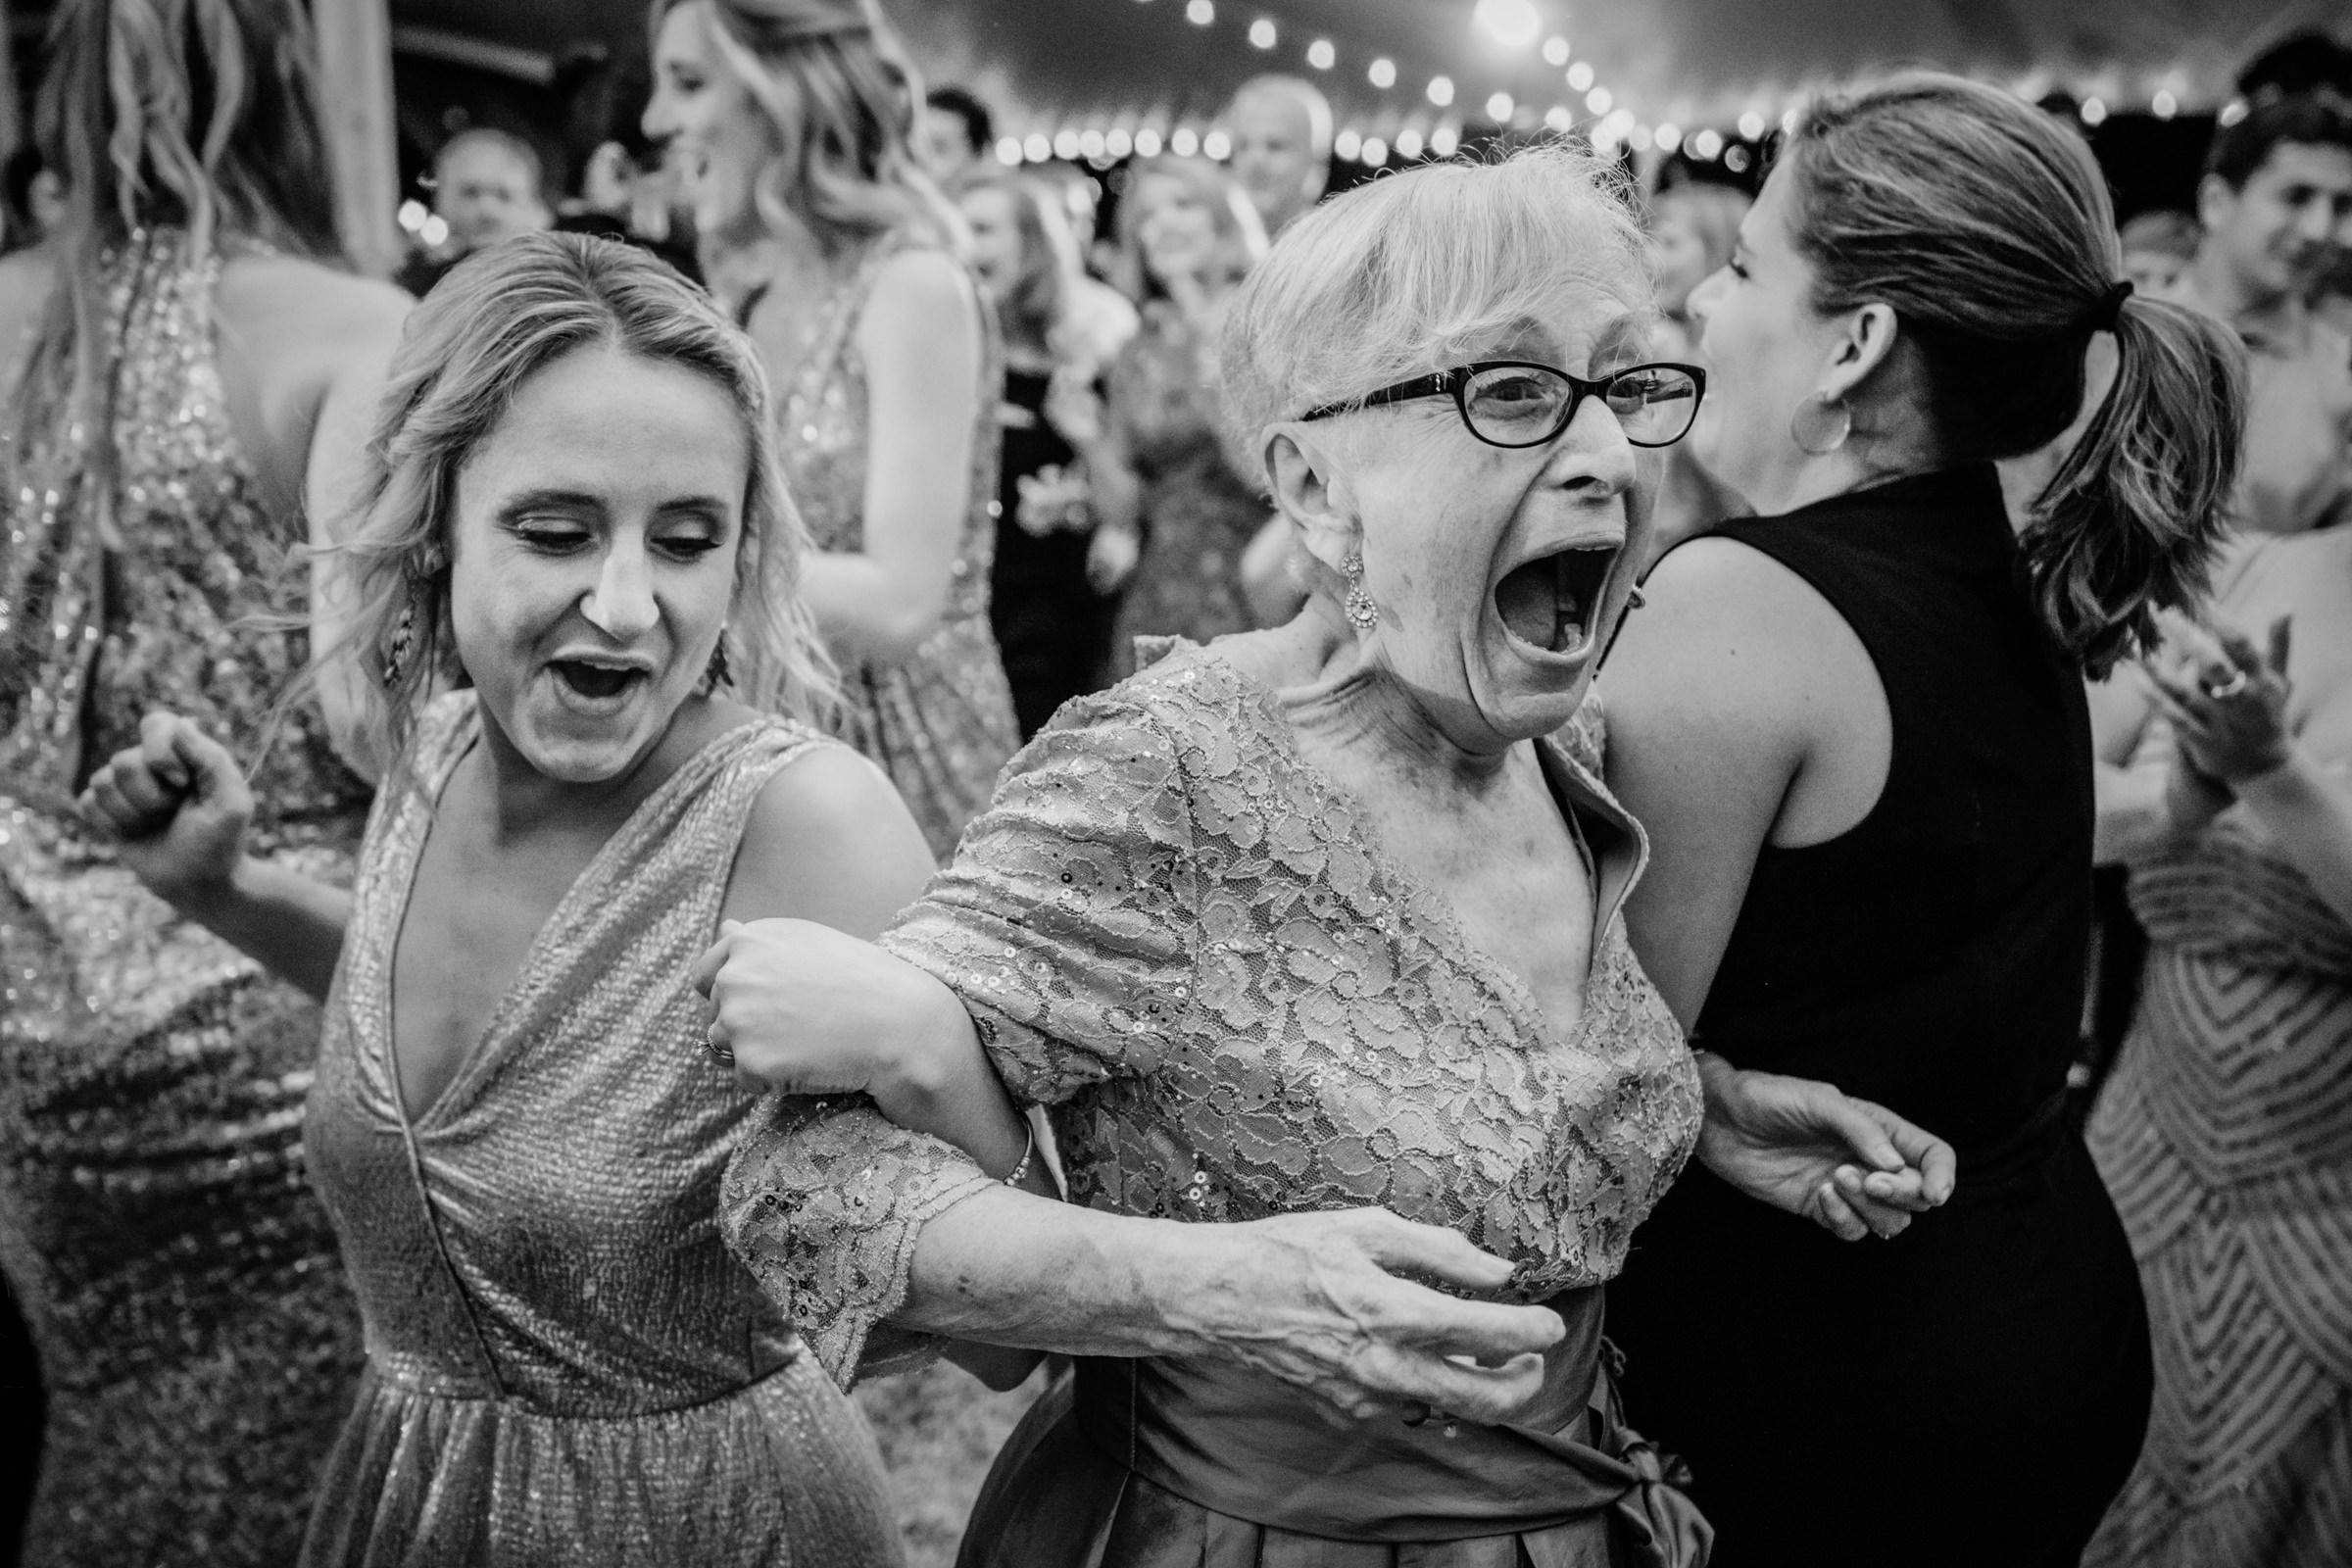 Mom and bridesmaid dancing with others - photo by Sasha Reiko Photography